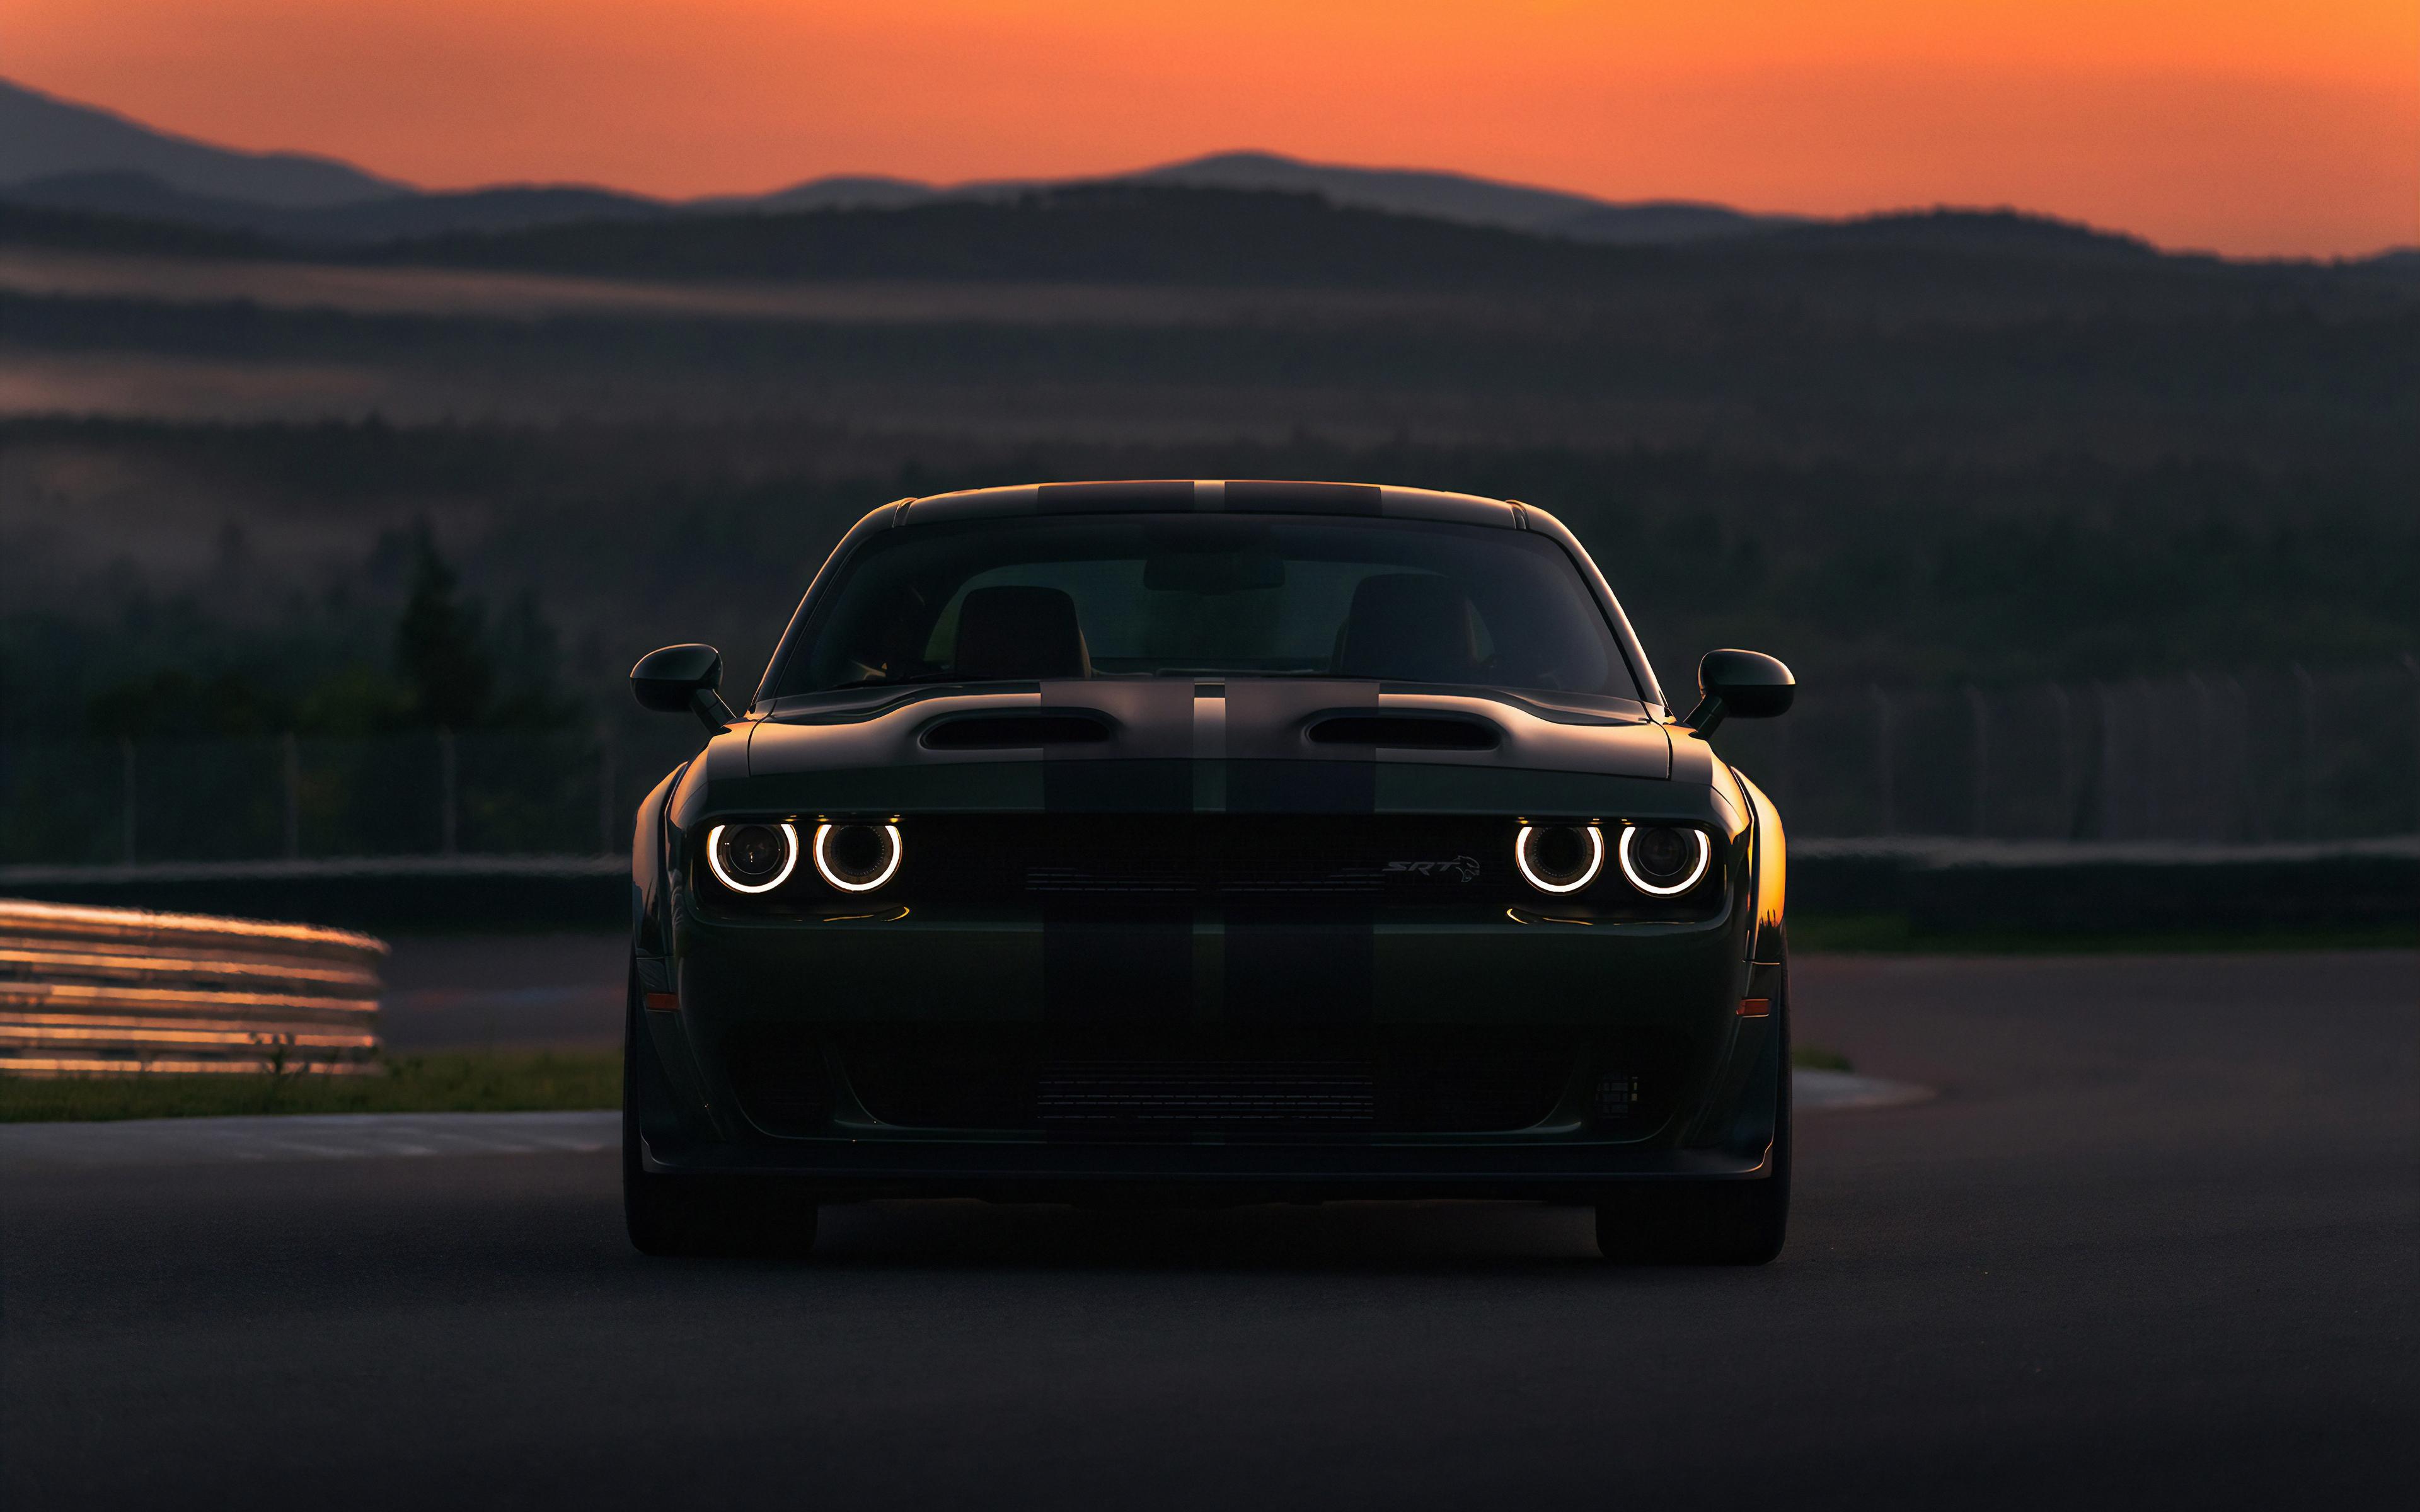 Download 3840x2400 Wallpaper Dodge Charger Srt Hellcat Dark